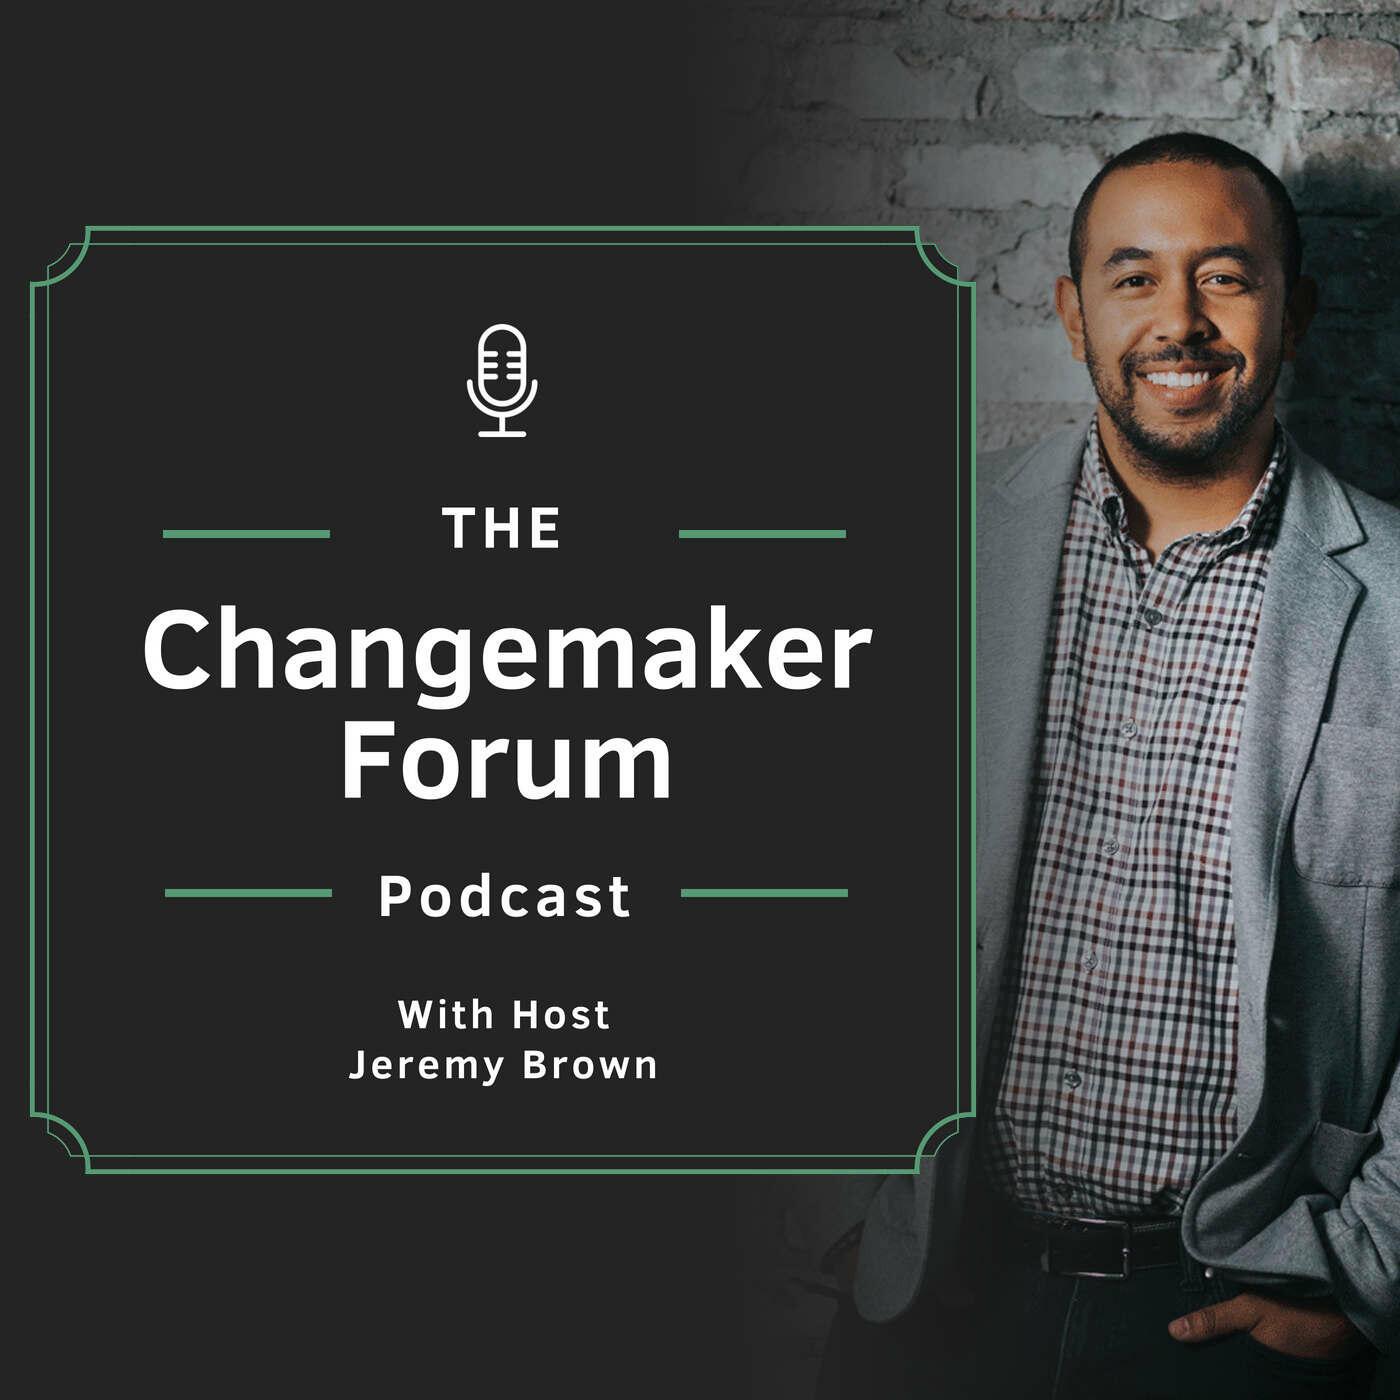 Changemaker Forum Podcast